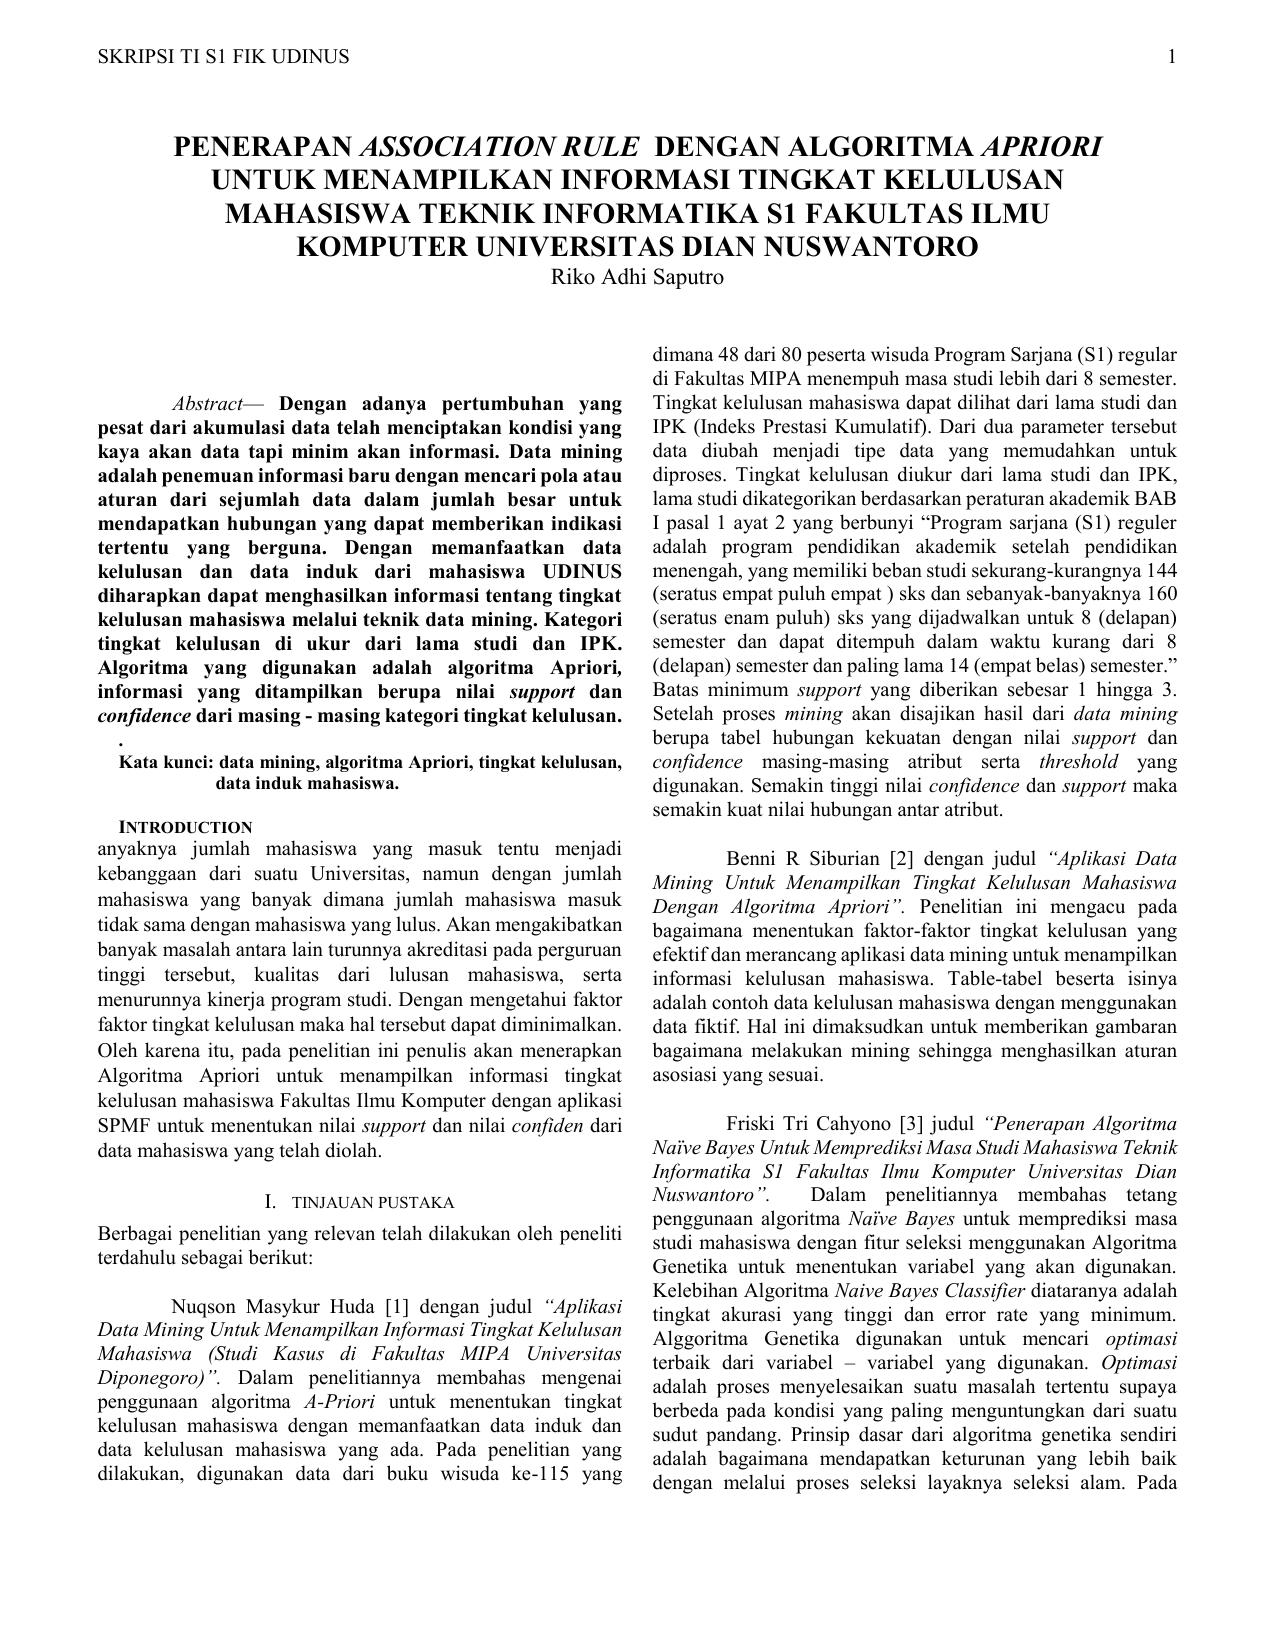 Penerapan Association Rule Dengan Algoritma Apriori Untuk